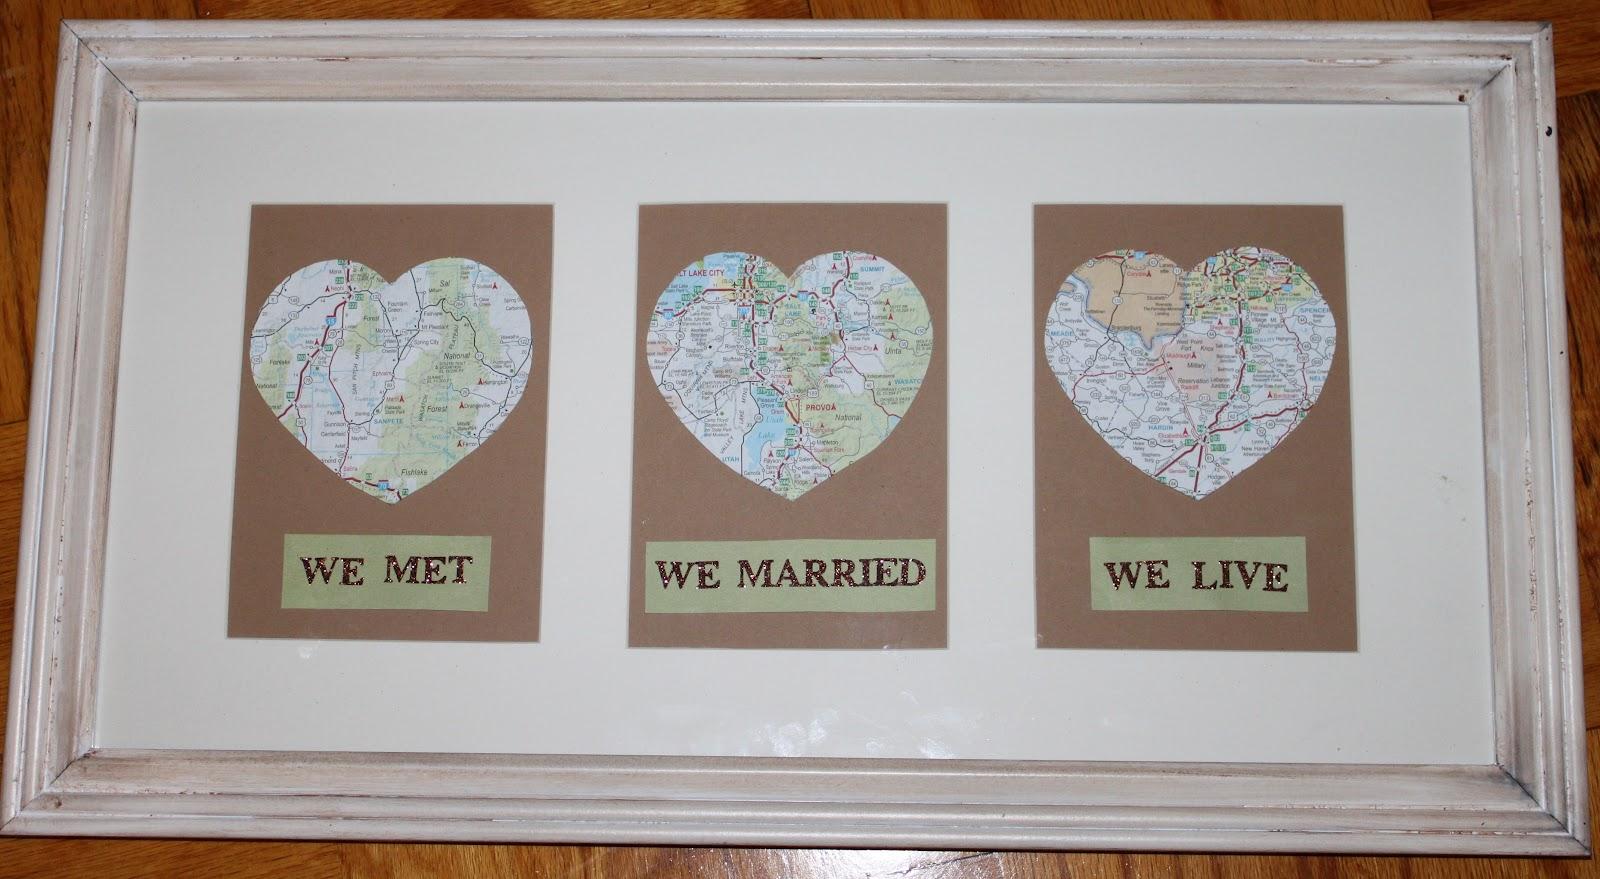 We met we married we live